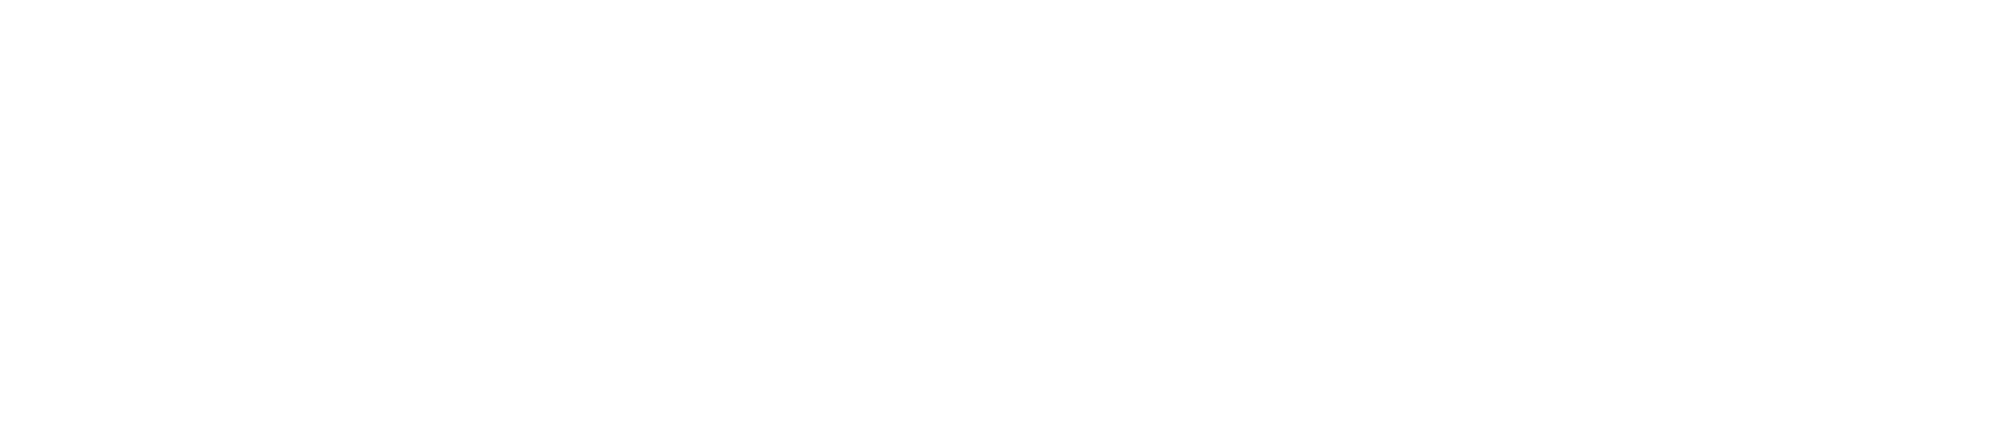 billboard logo white.png